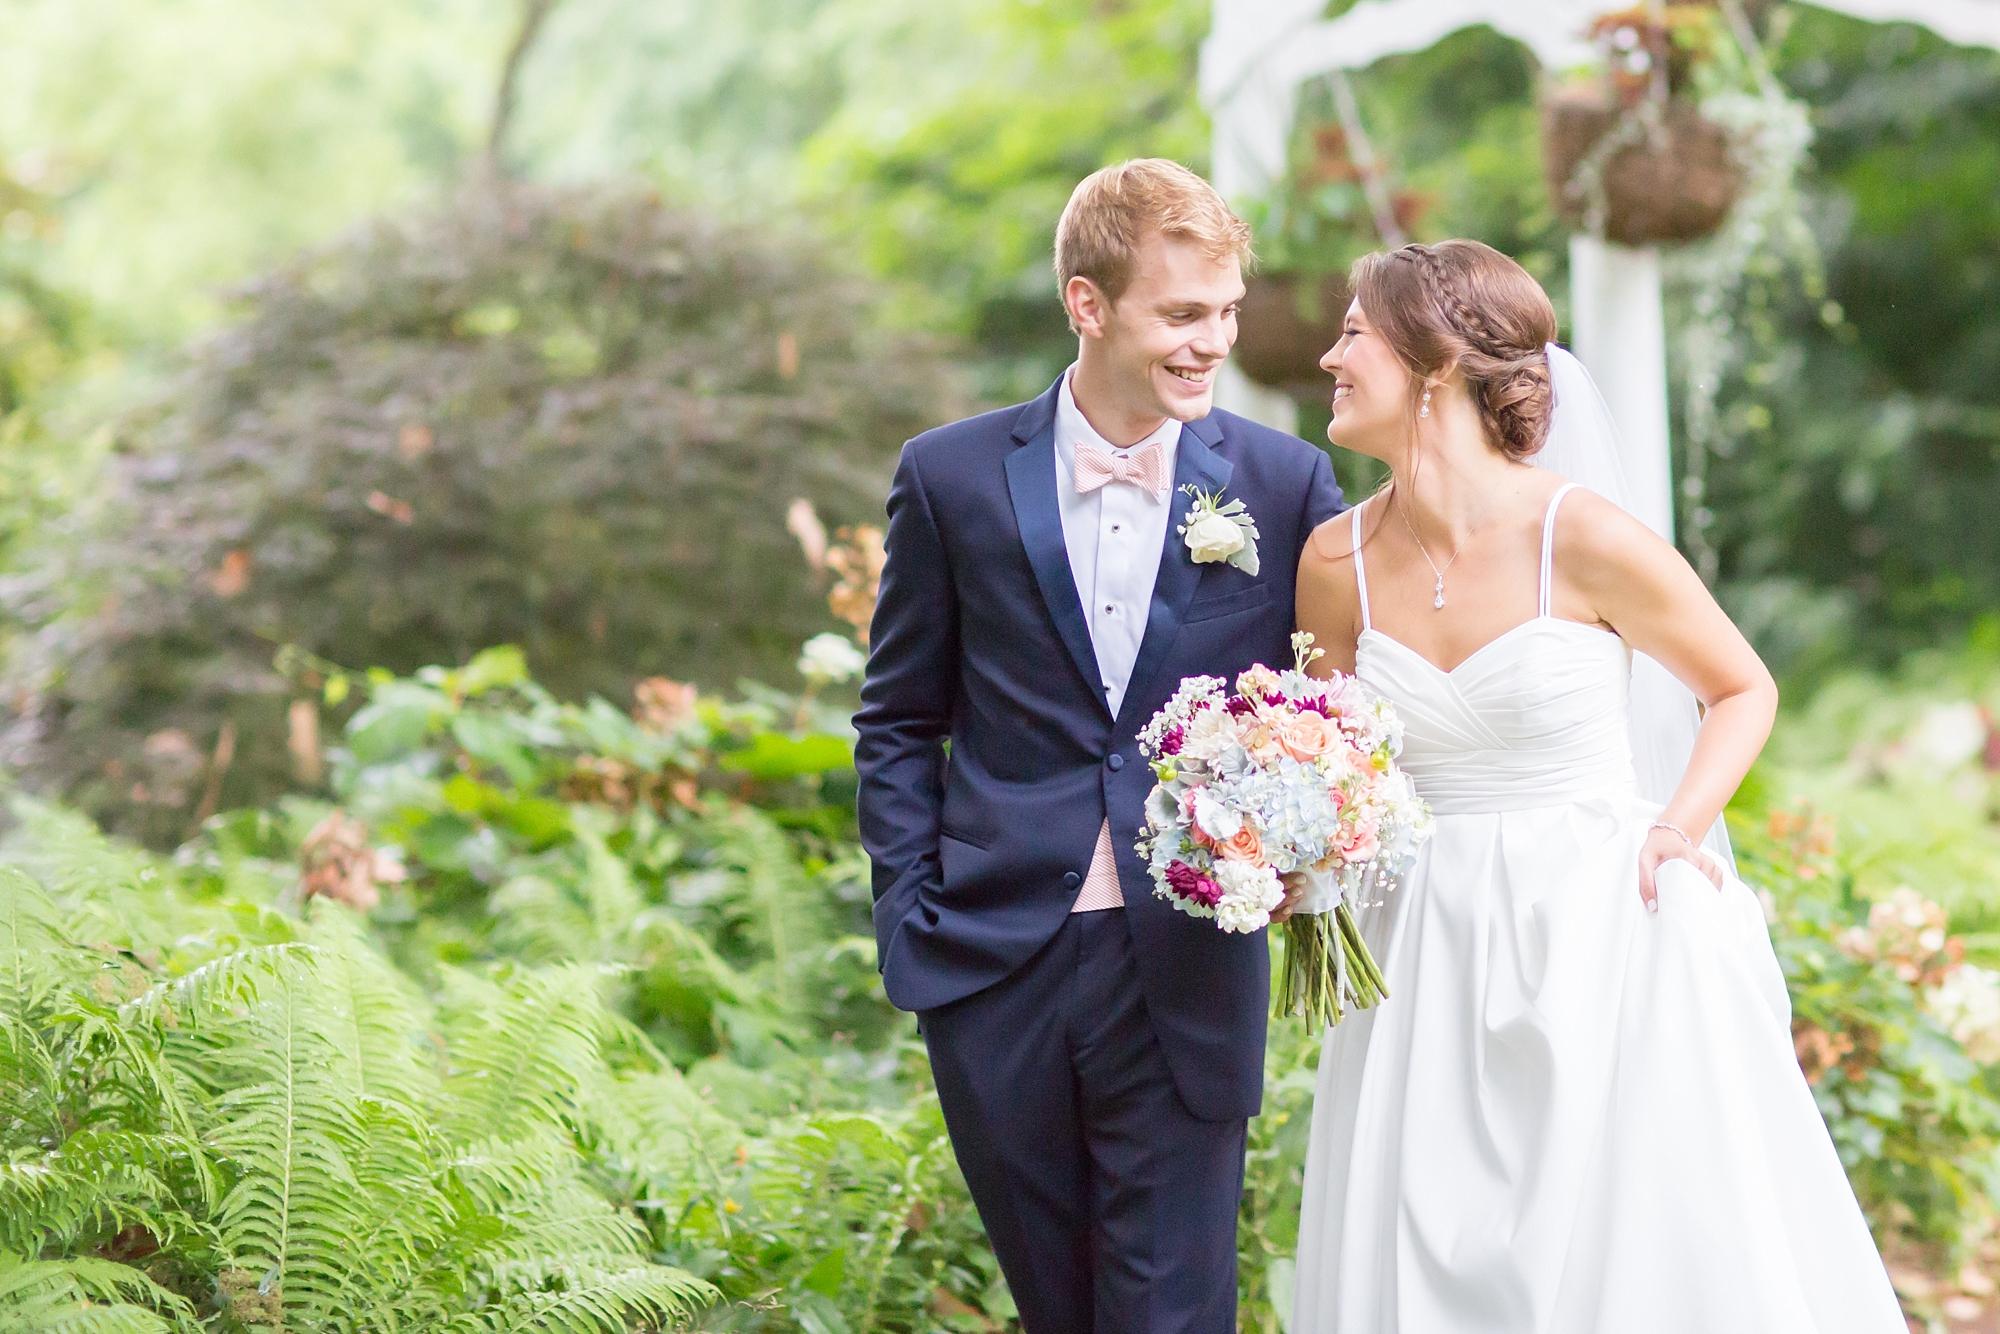 Russell 5-Bride & Groom Portraits-793_anna grace photography baltimore maryland wedding photographer elkridge furnace inn wedding photo.jpg